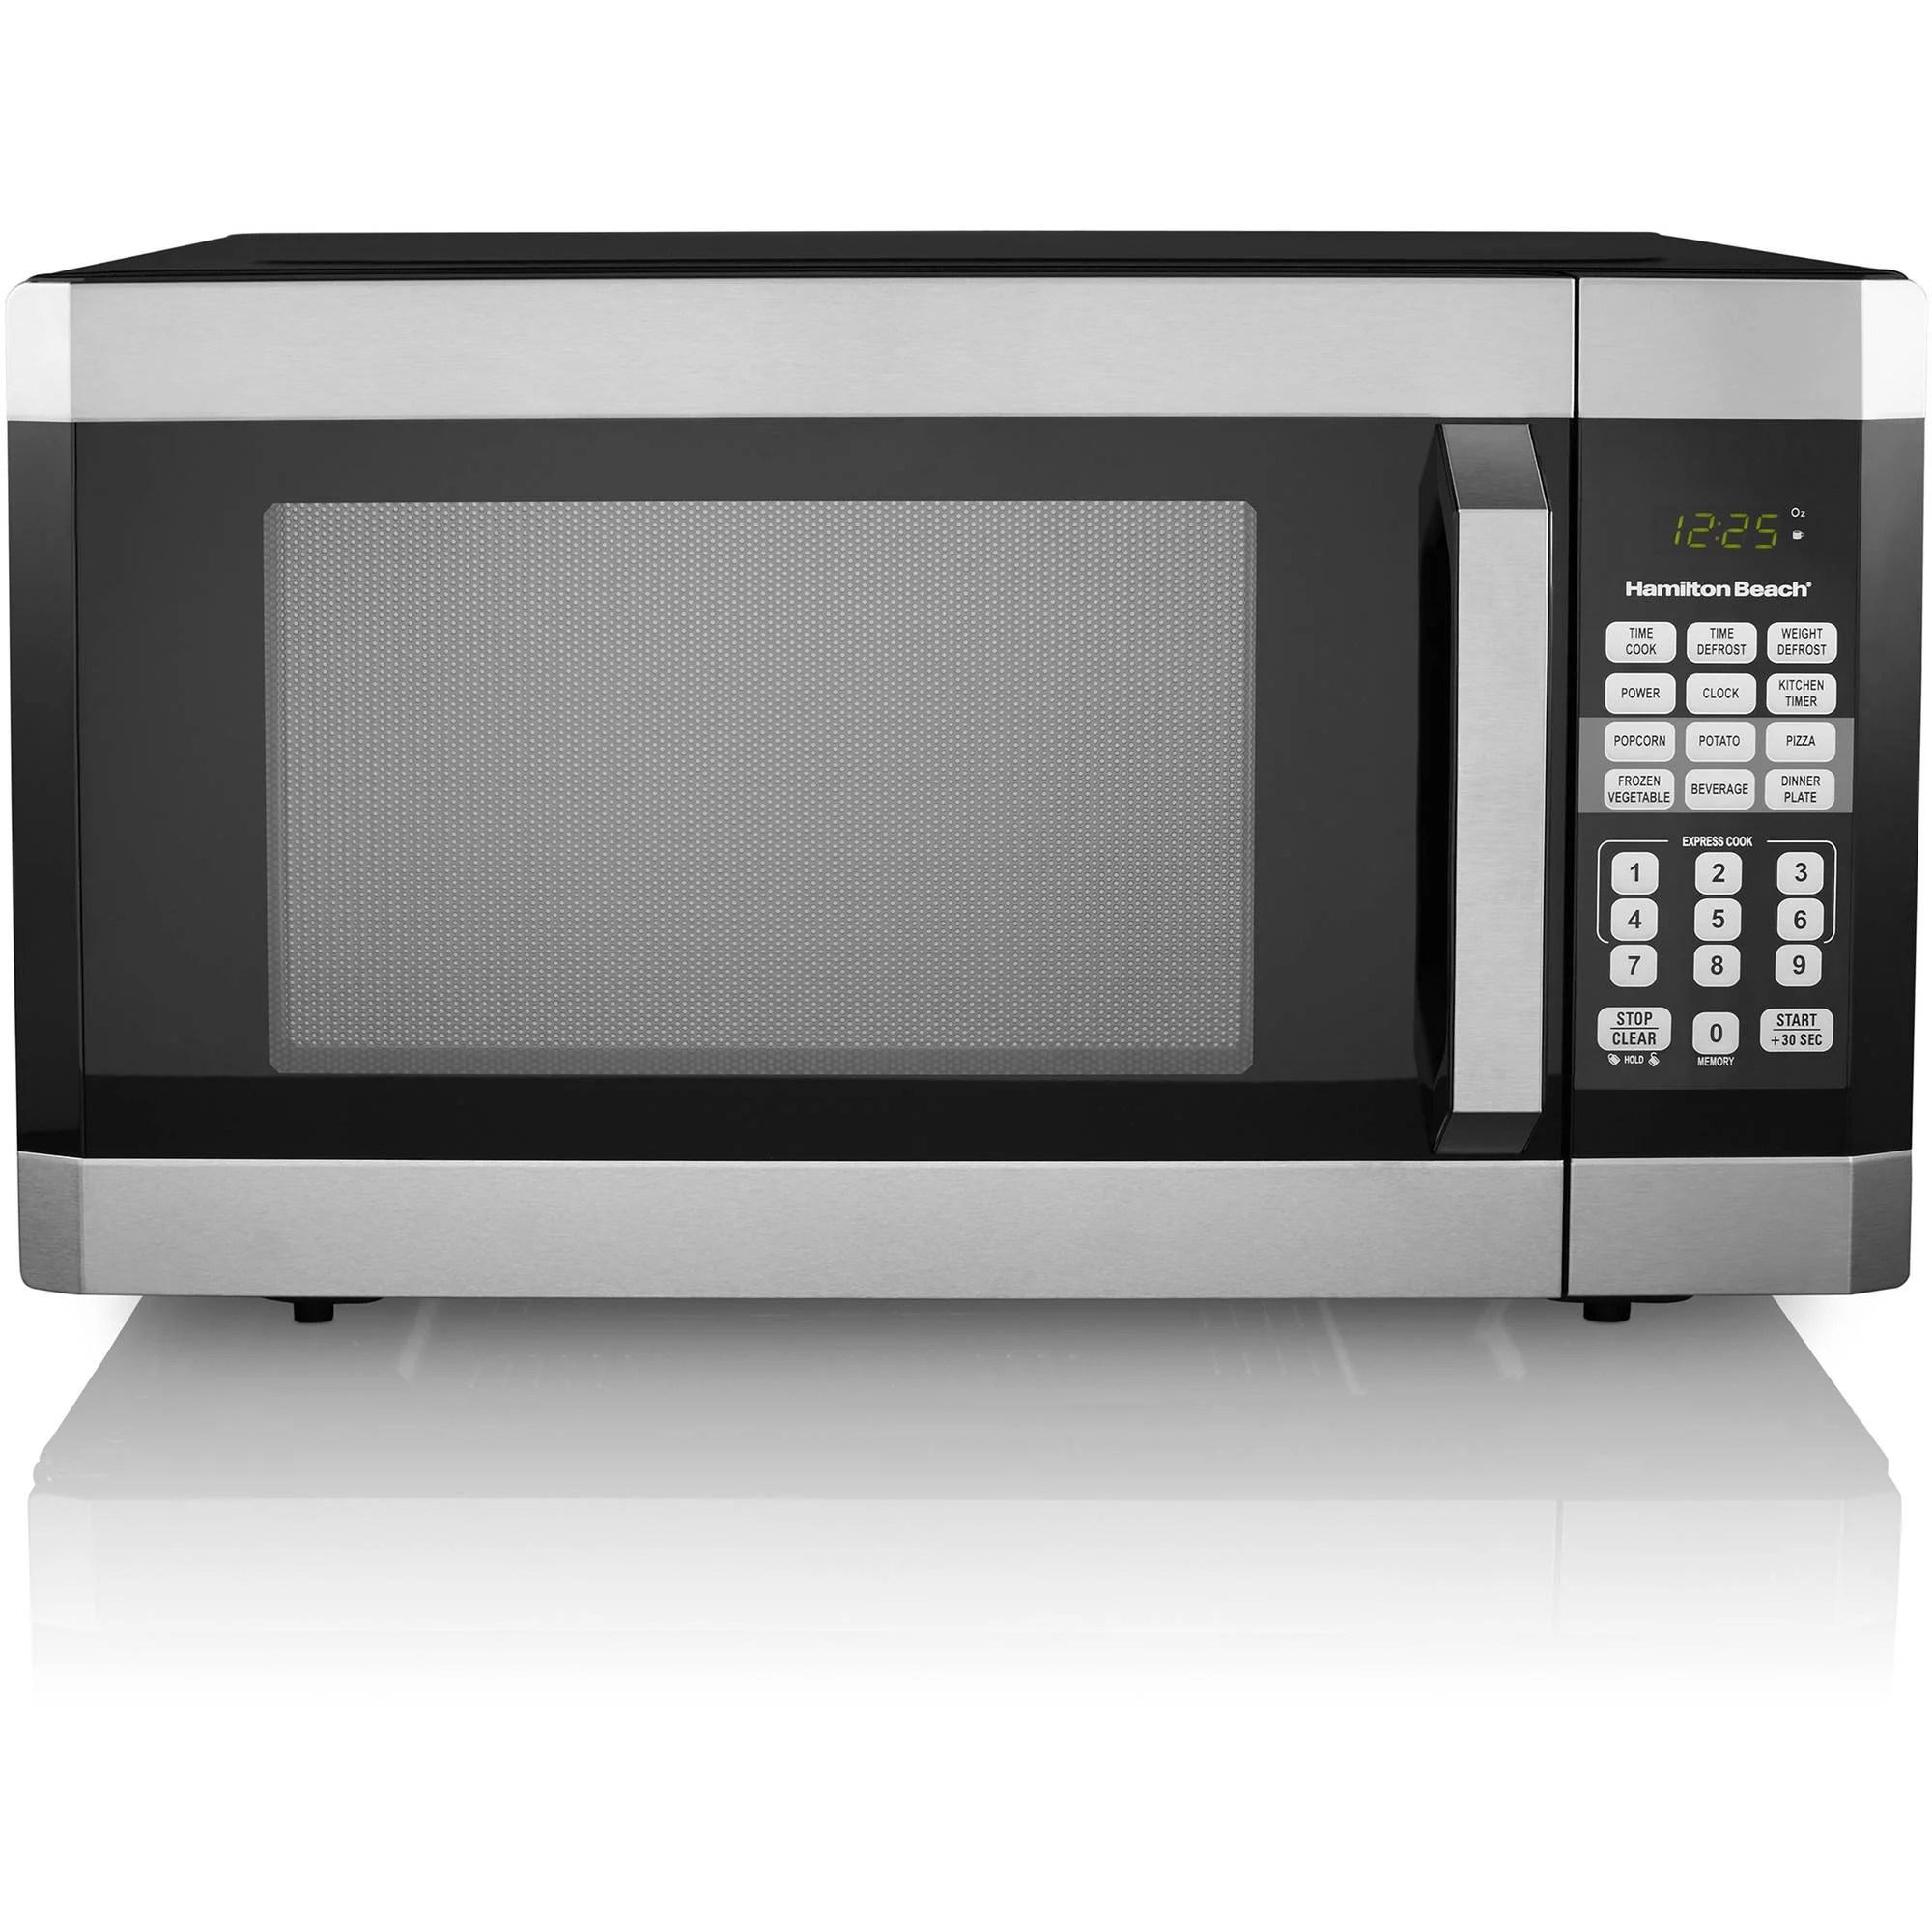 hamilton beach 1 6 cu ft digital microwave oven stainless steel